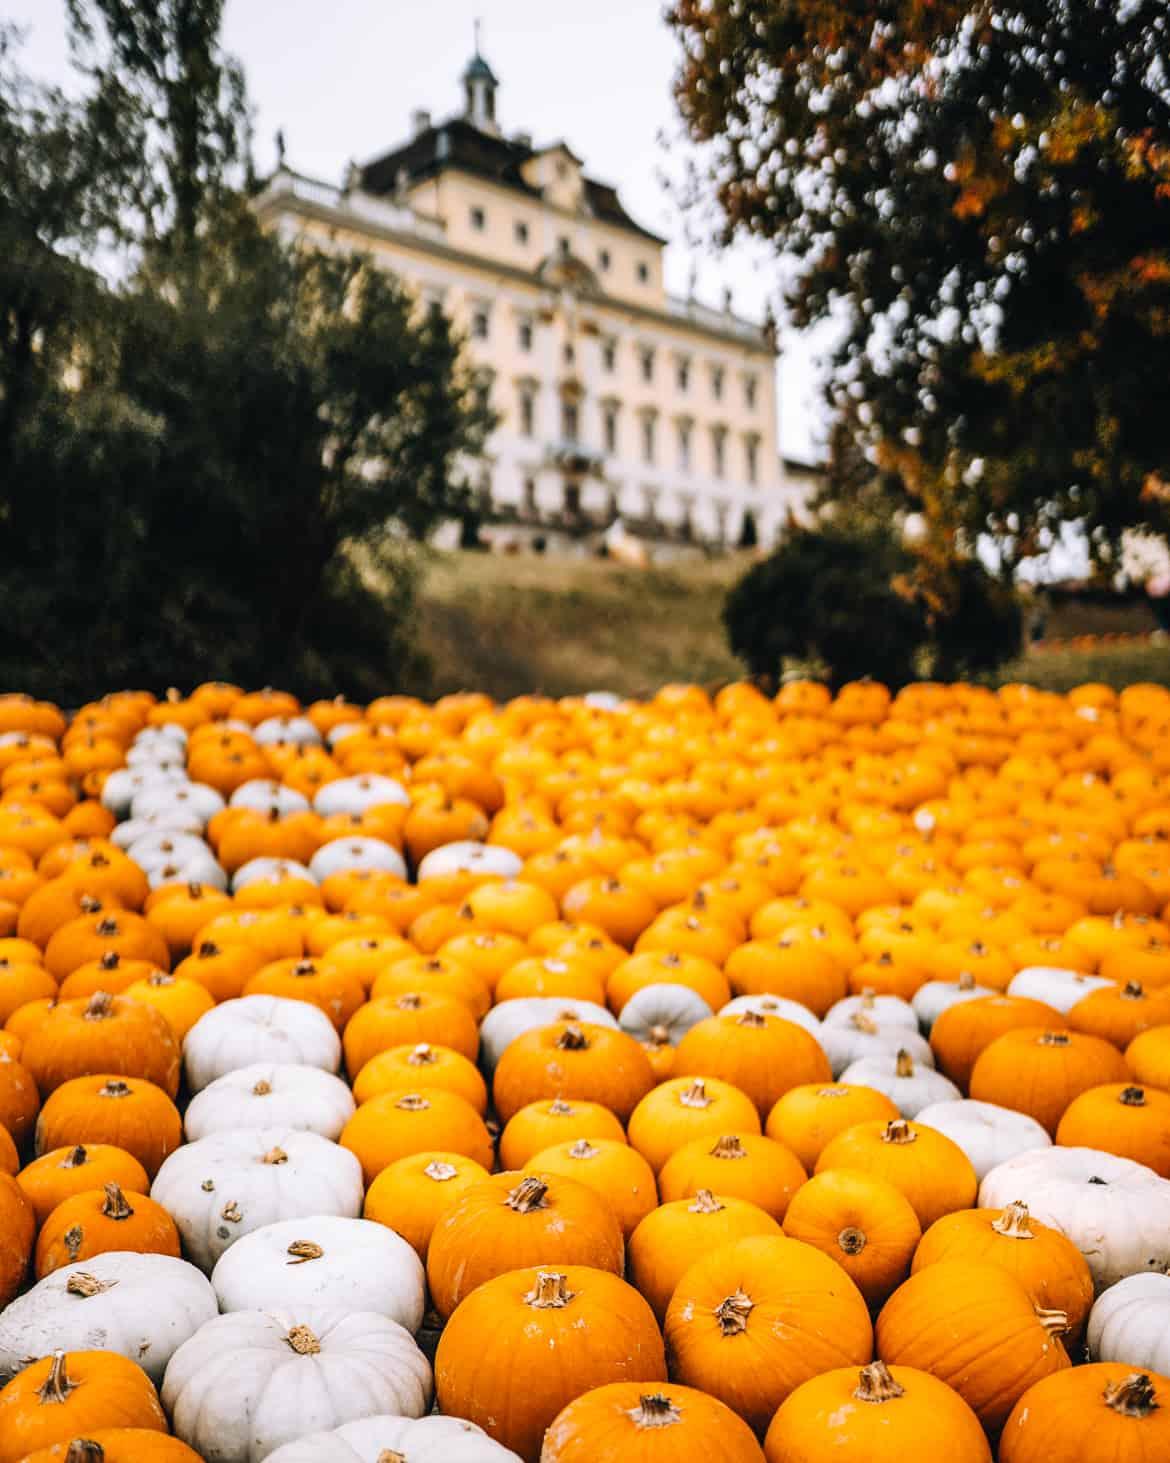 Stuttgart im Herbst - Cannstatter Wasen, Kürbisfestival & #tastyStuttgart: Kürbisausstellung im blühenden Barock am Schloss Ludwigsburg